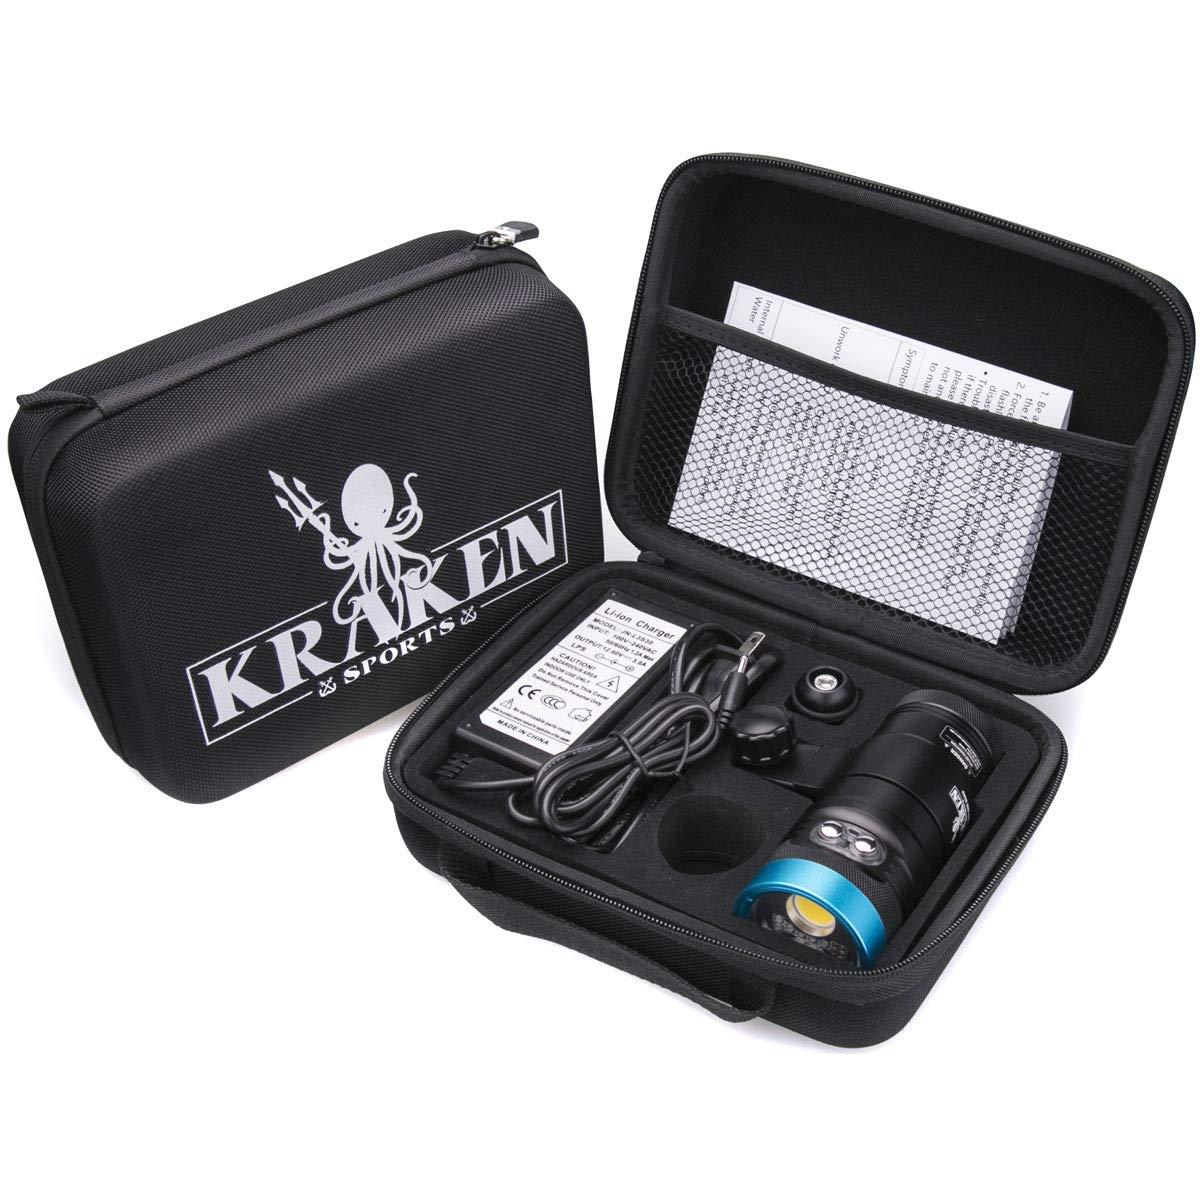 Kraken Sports Hydra 3500S+ Video Light WideSpotRedUVStrobe by Kraken Sports